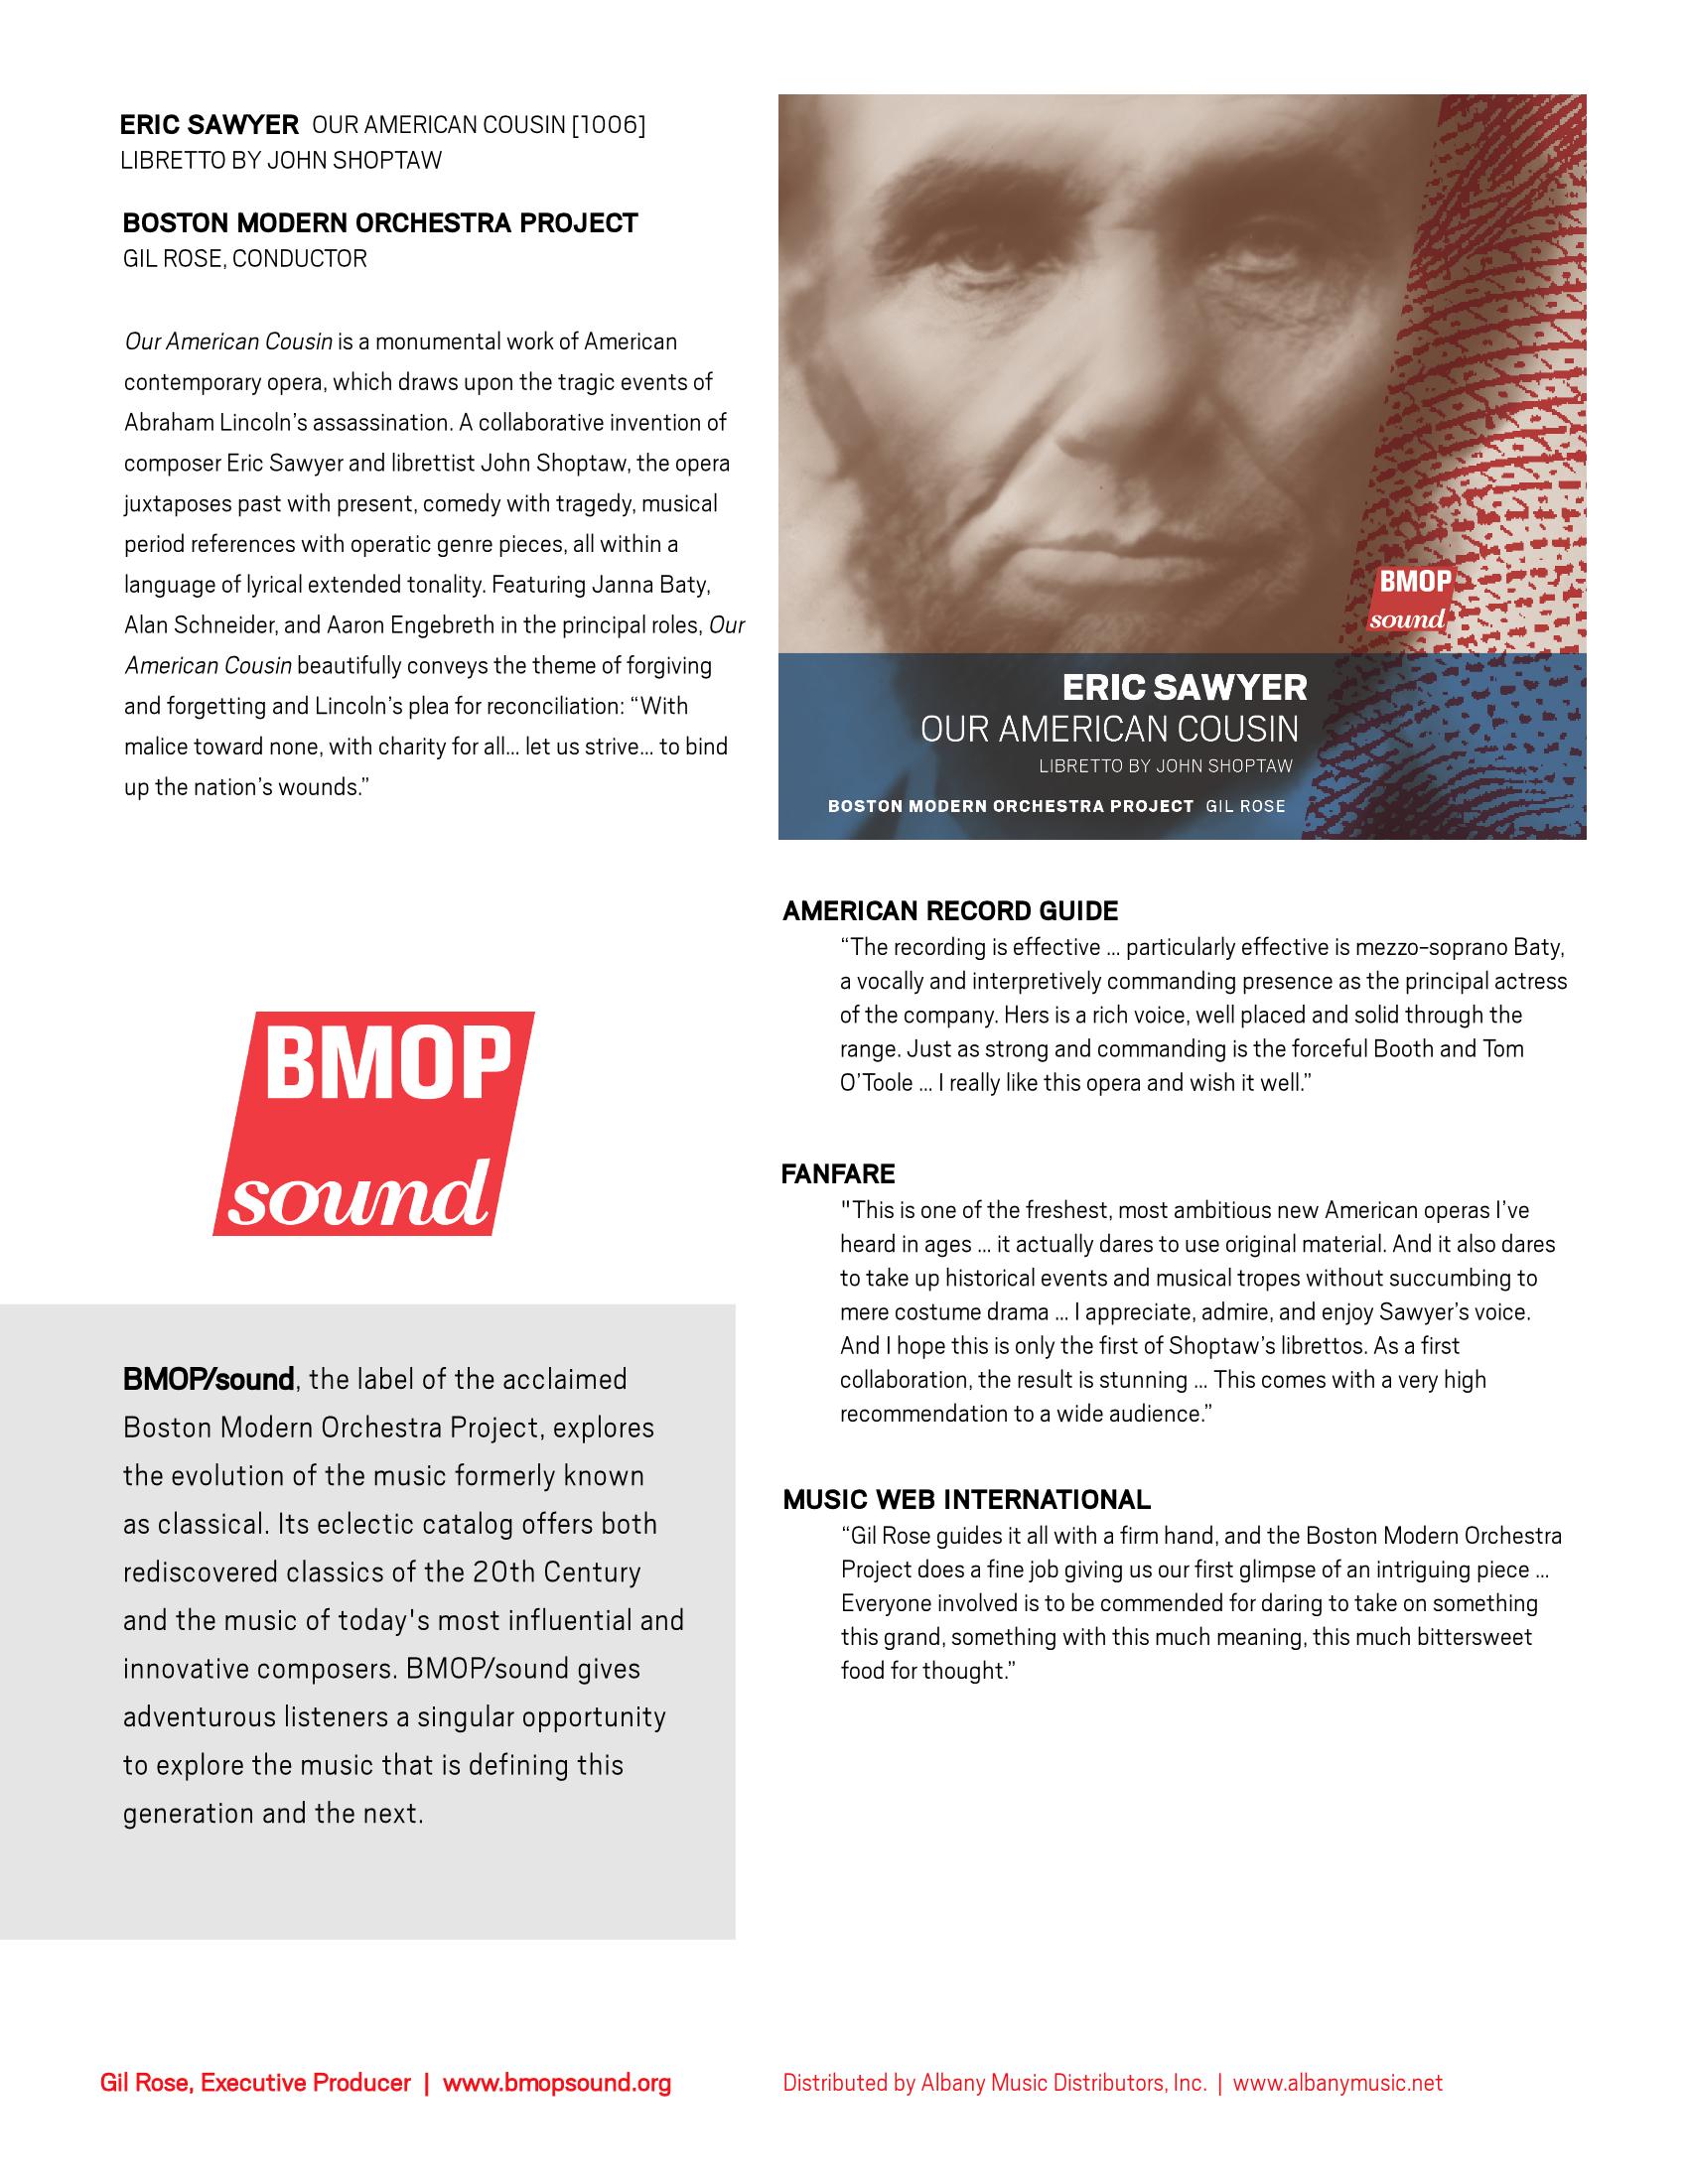 Sawyer - BMOPsound 1006 one-sheet.png